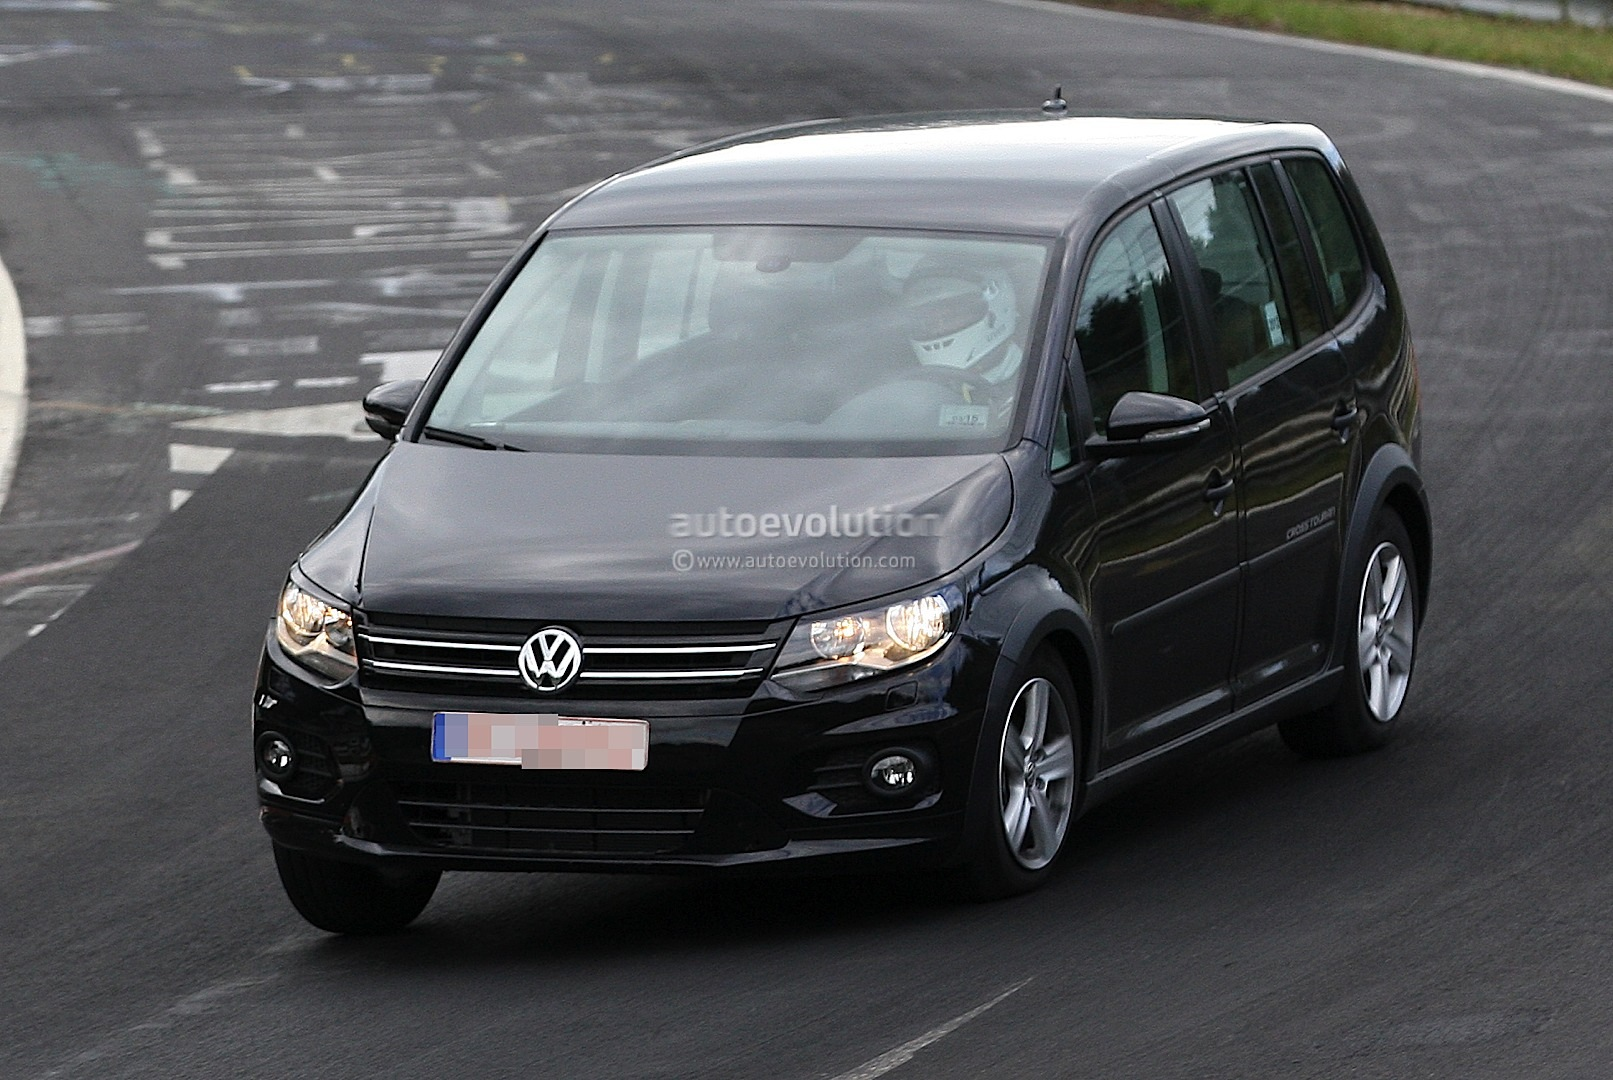 spyshots new volkswagen touran crosstouran autoevolution. Black Bedroom Furniture Sets. Home Design Ideas